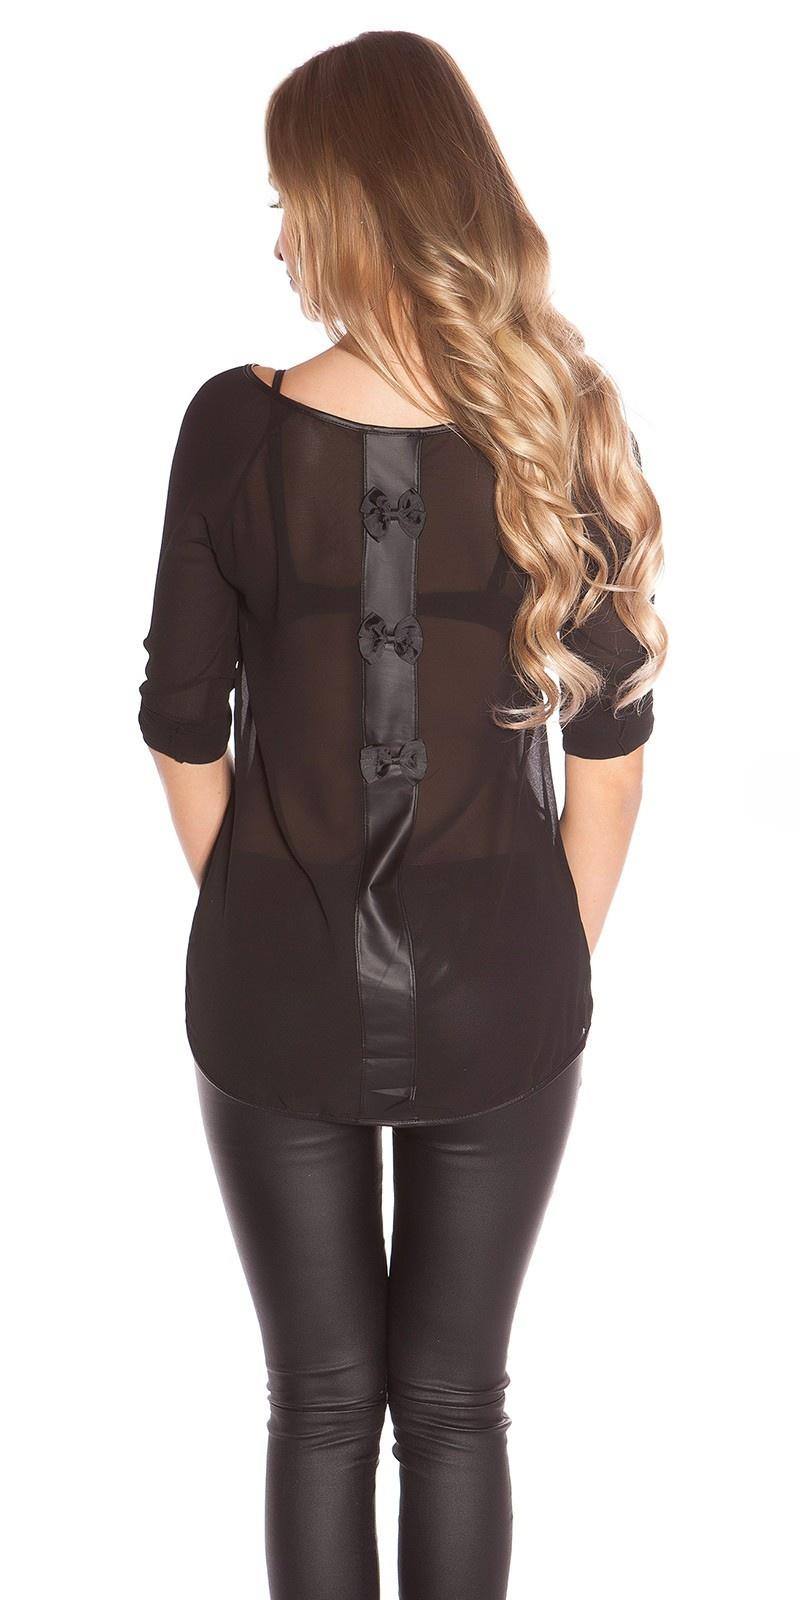 Trendy KouCla blouse with bows Black